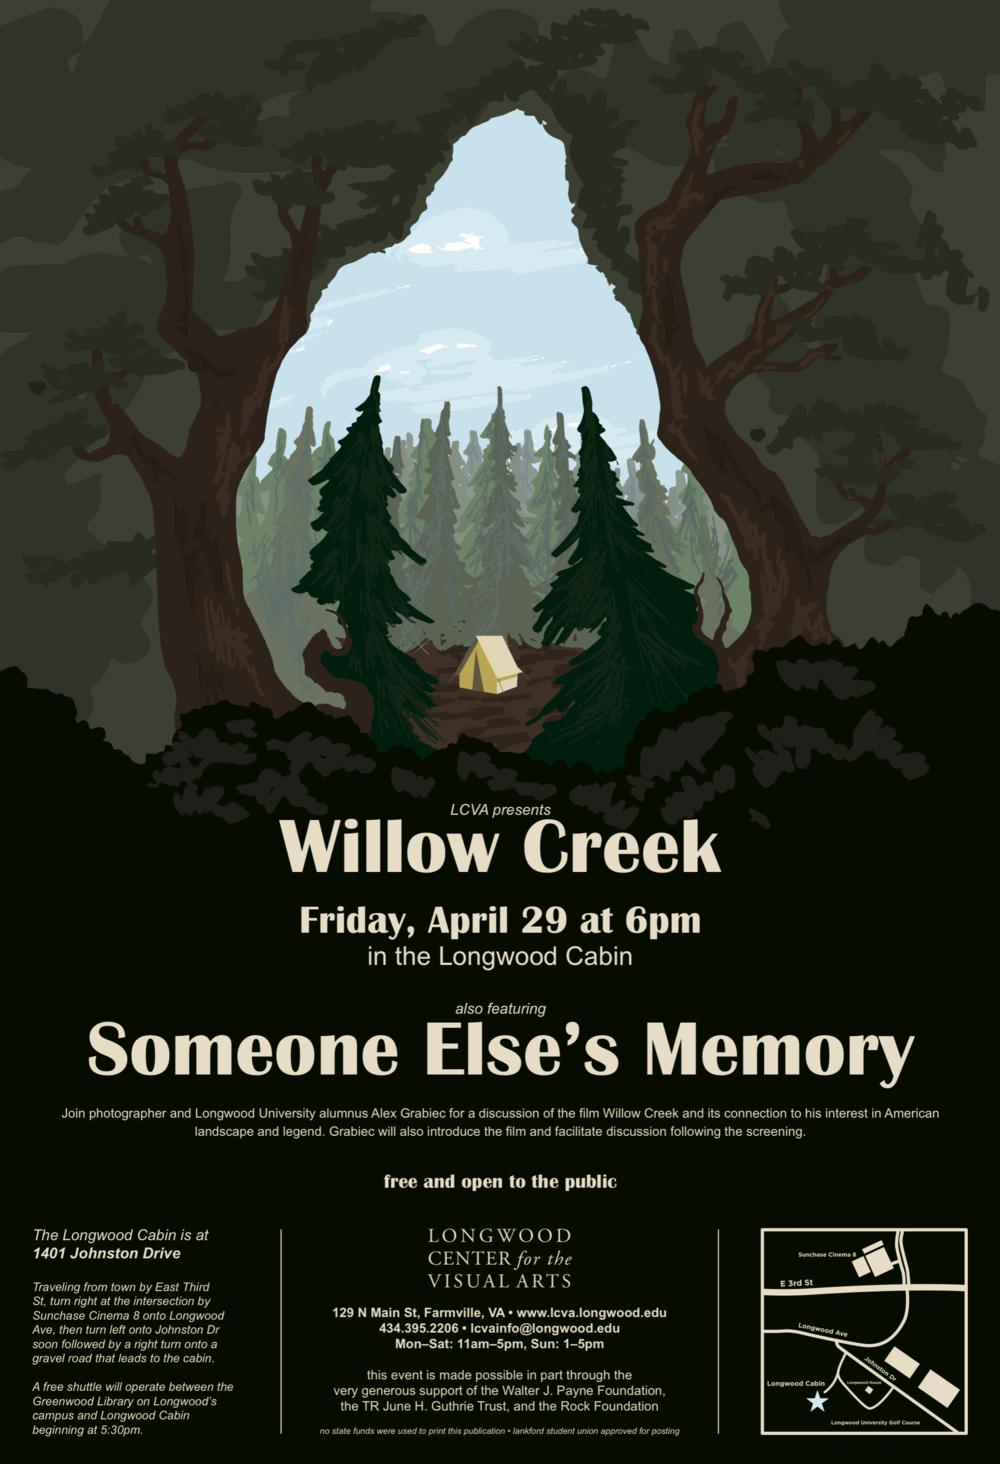 Willow Creek Screening